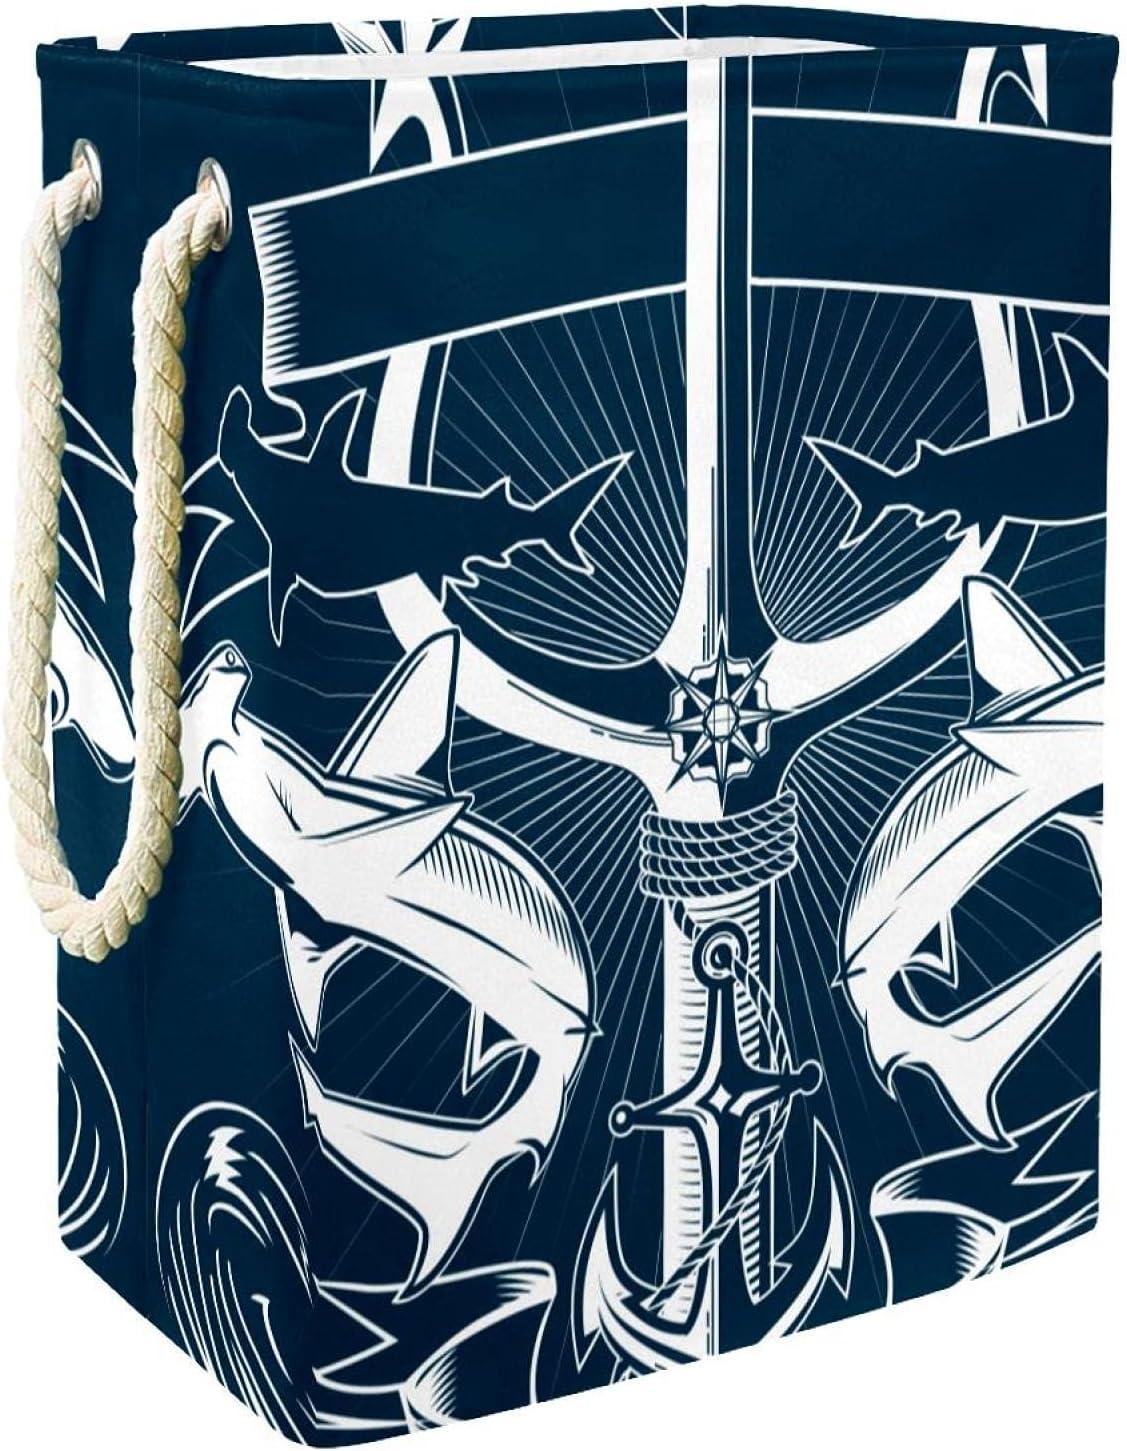 Regular dealer Max 63% OFF Antique Nautical Trident Anchor Laundry Handles With Hamper Larg